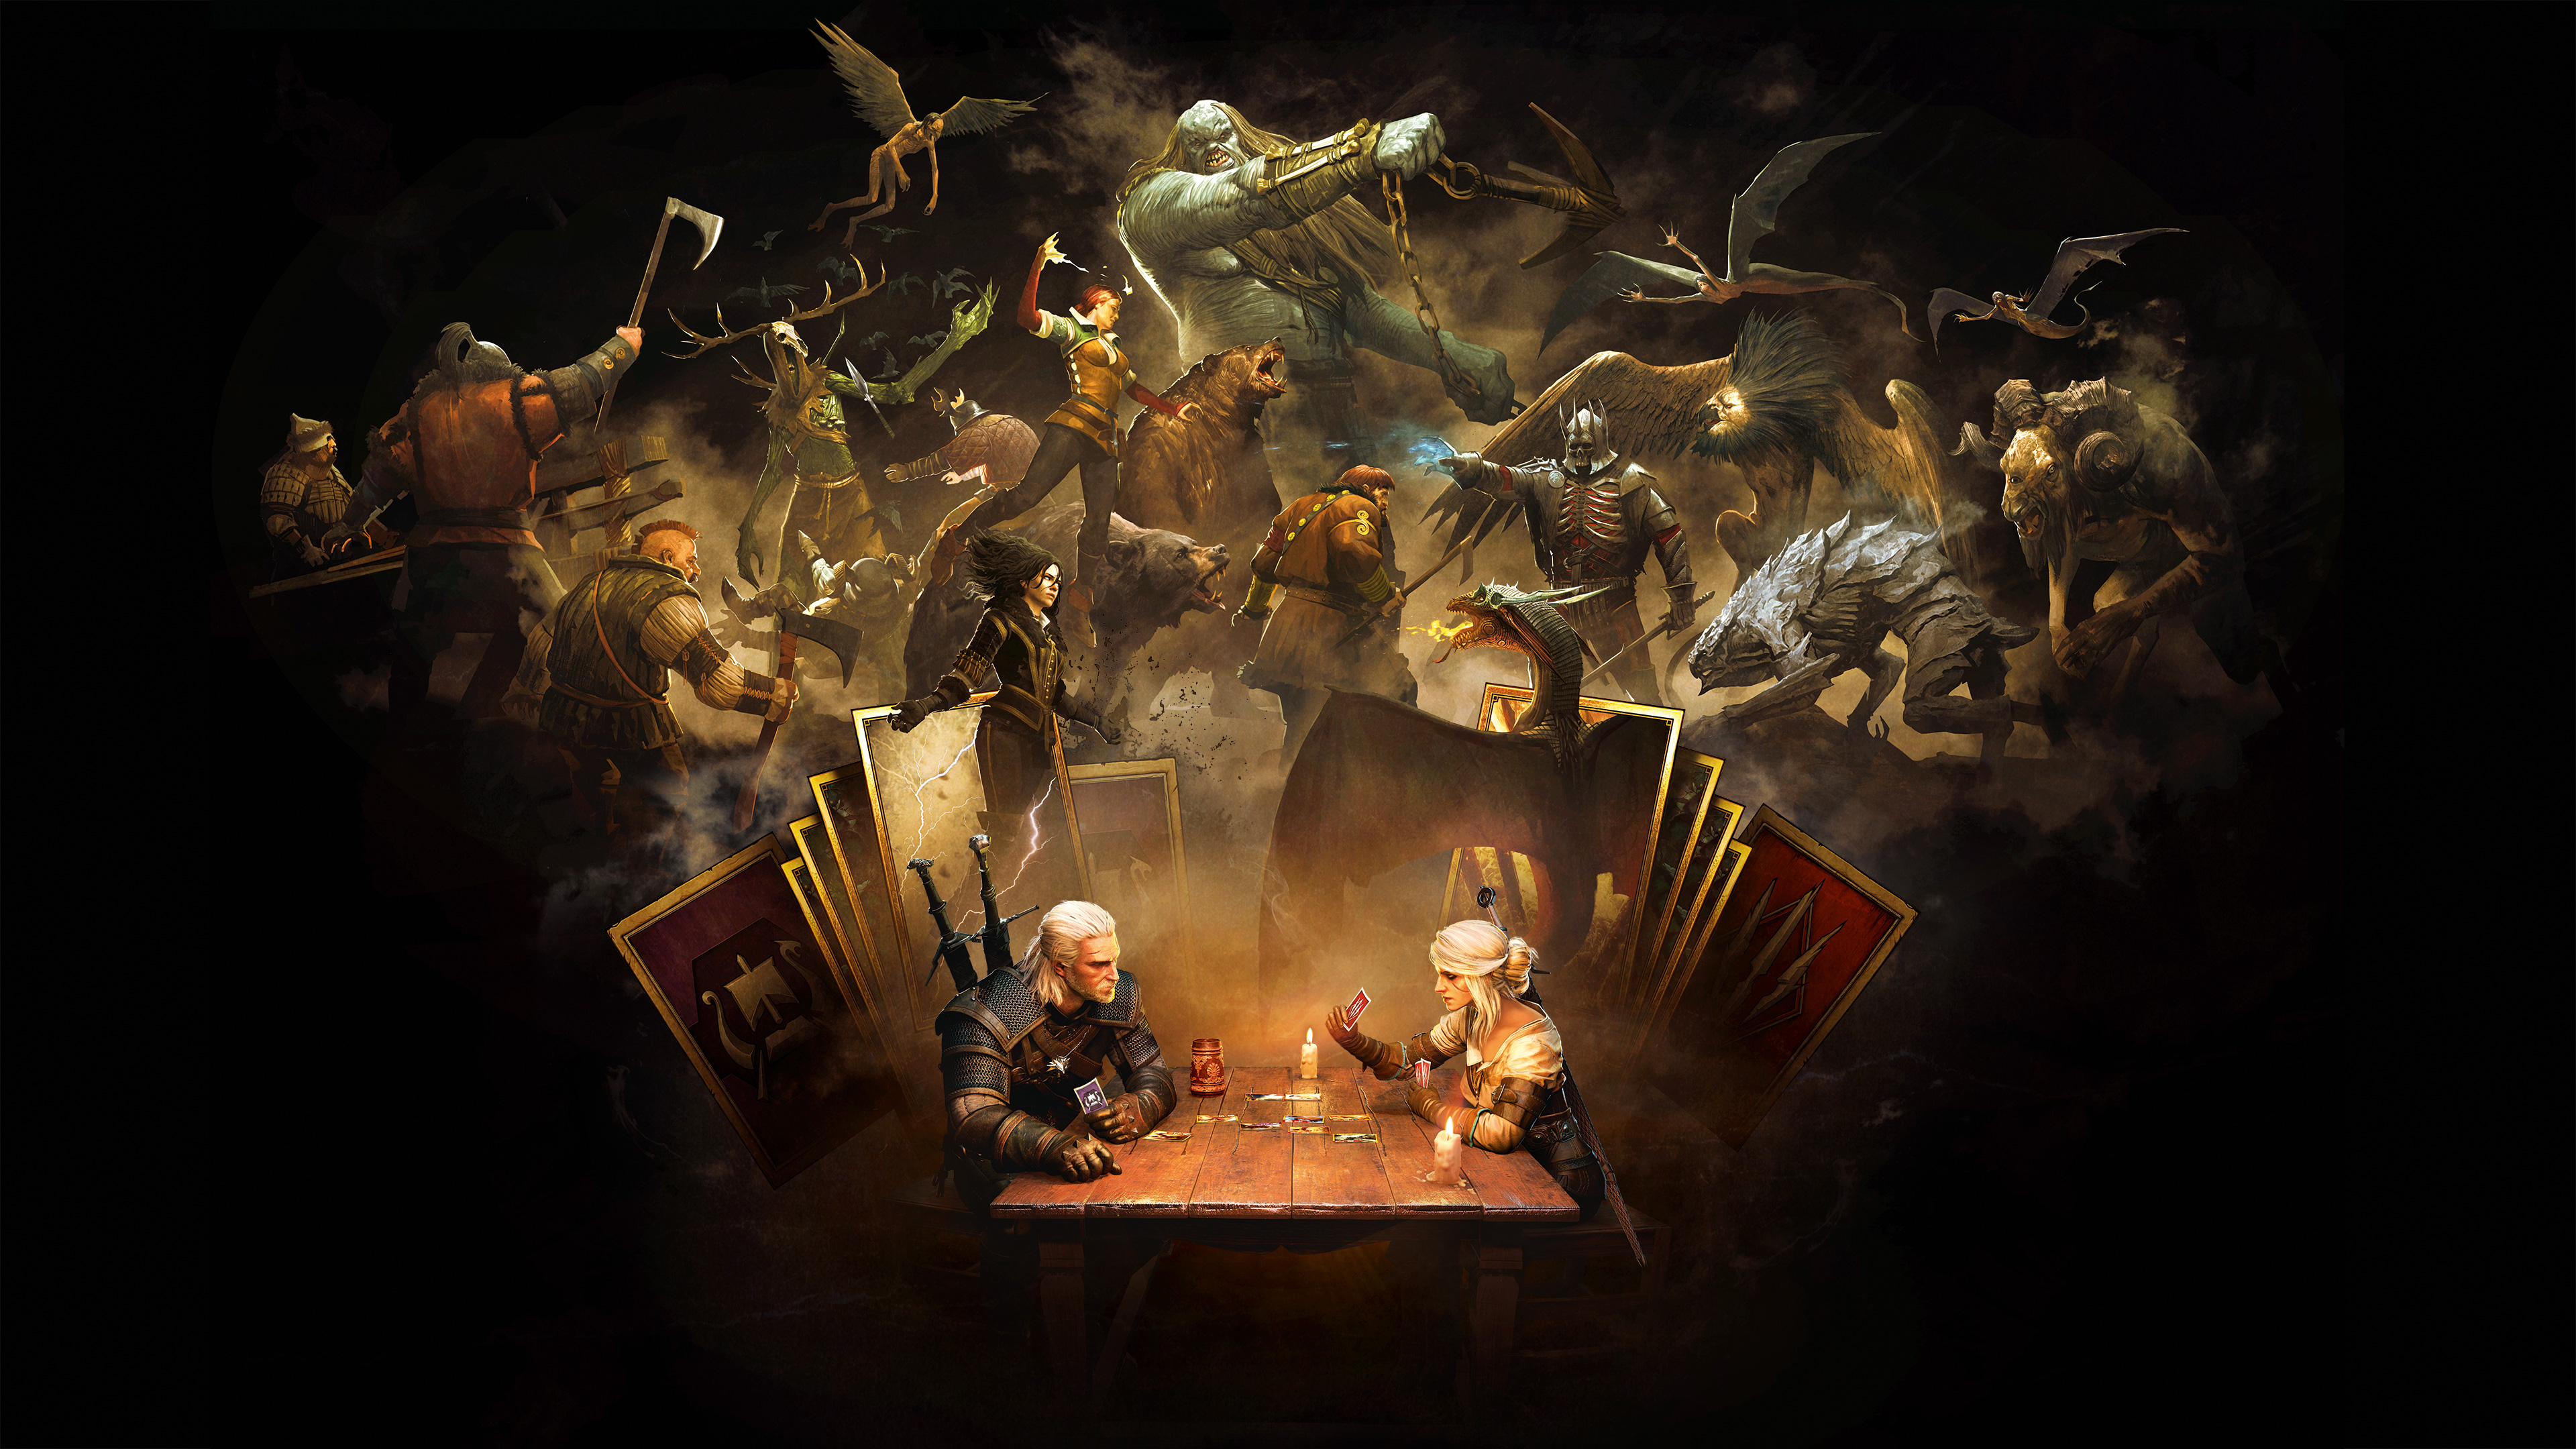 Geralt Of Rivia Eredin Triss Merigold Gwent The 3840 X